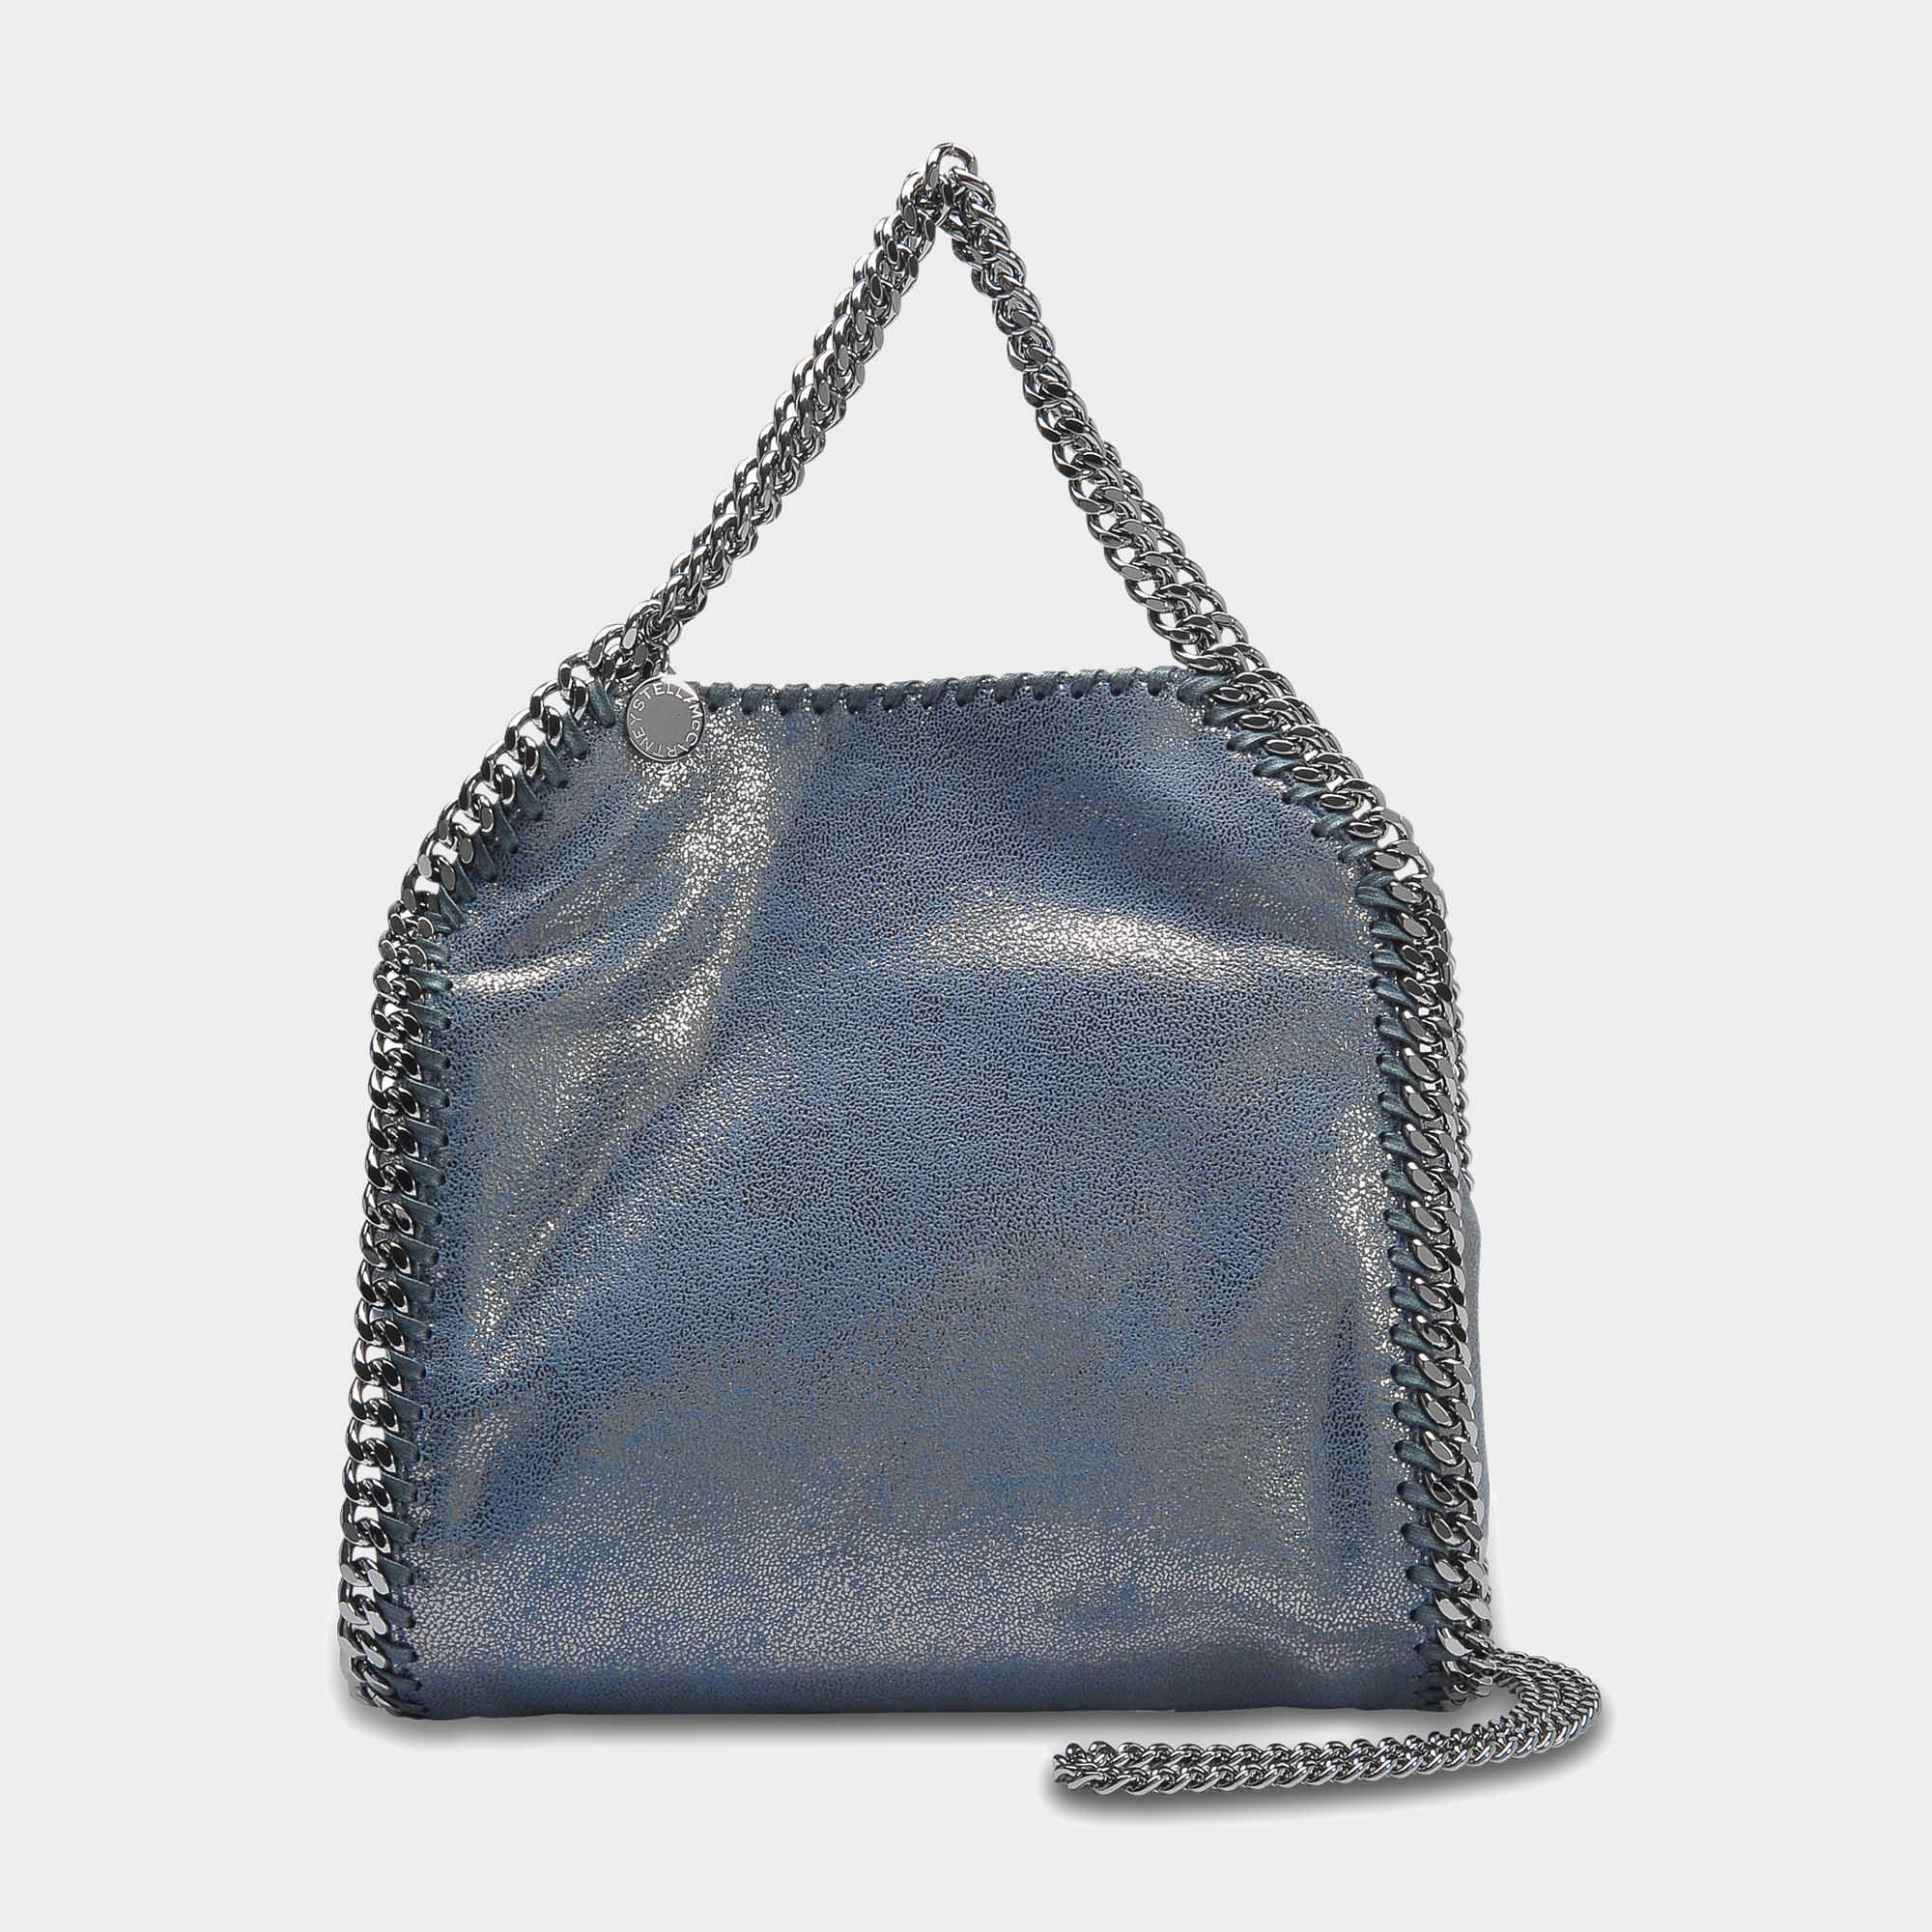 Lyst - Stella McCartney Metallic Shaggy Deer Falabella Mini Tote Bag ... 7f17076b21